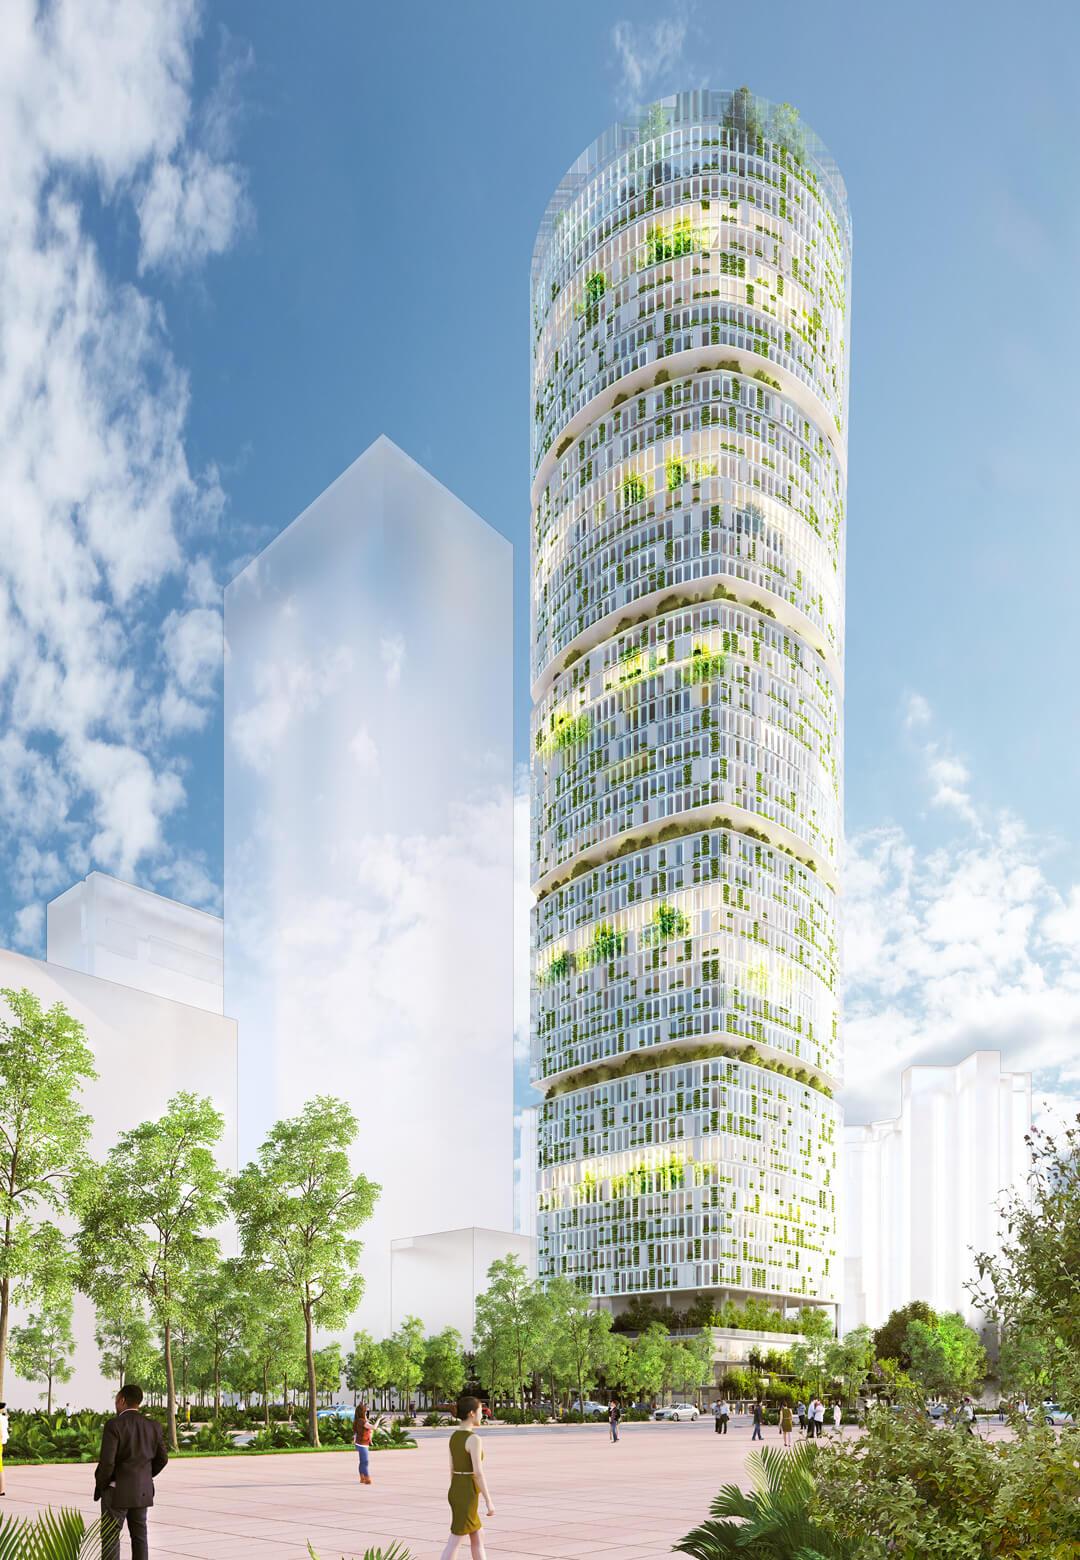 Carlo Ratti Associati has designed a 218m vertical hydroponic farm tower for Shenzhen, China| Jian Mu Tower by Carlo Ratti Associati | STIRworld